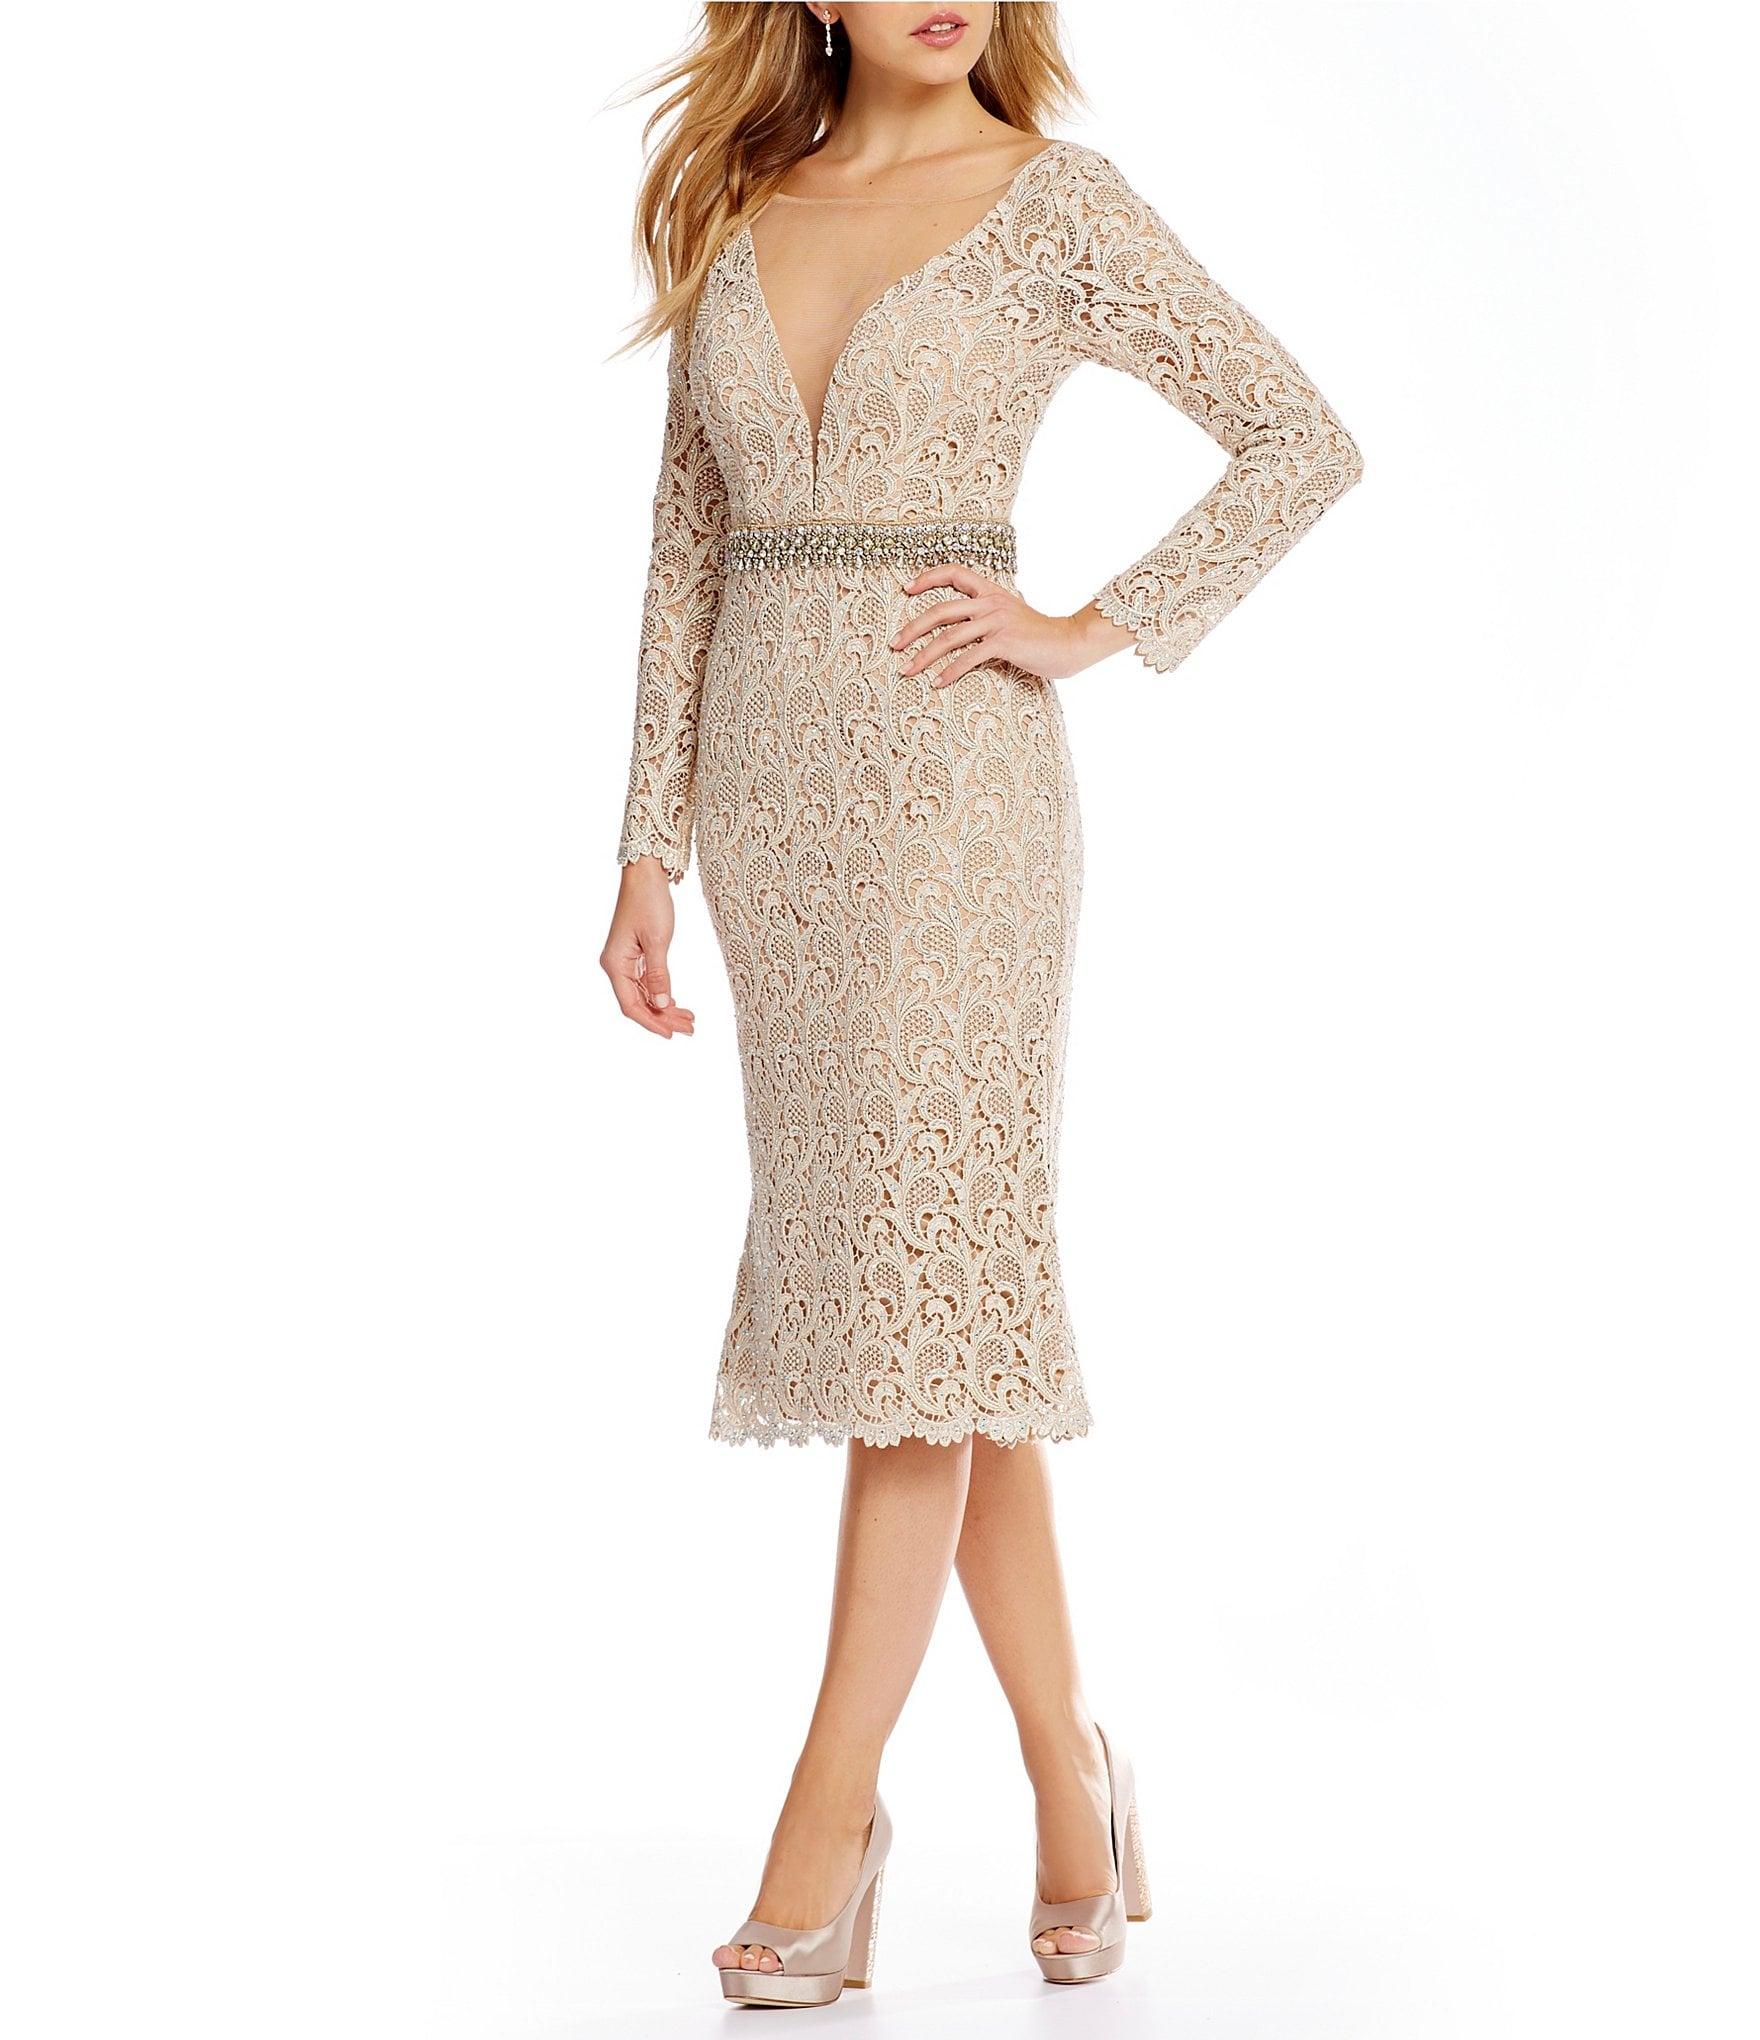 Terani Couture Beaded Lace Midi Sheath Dress Dillards